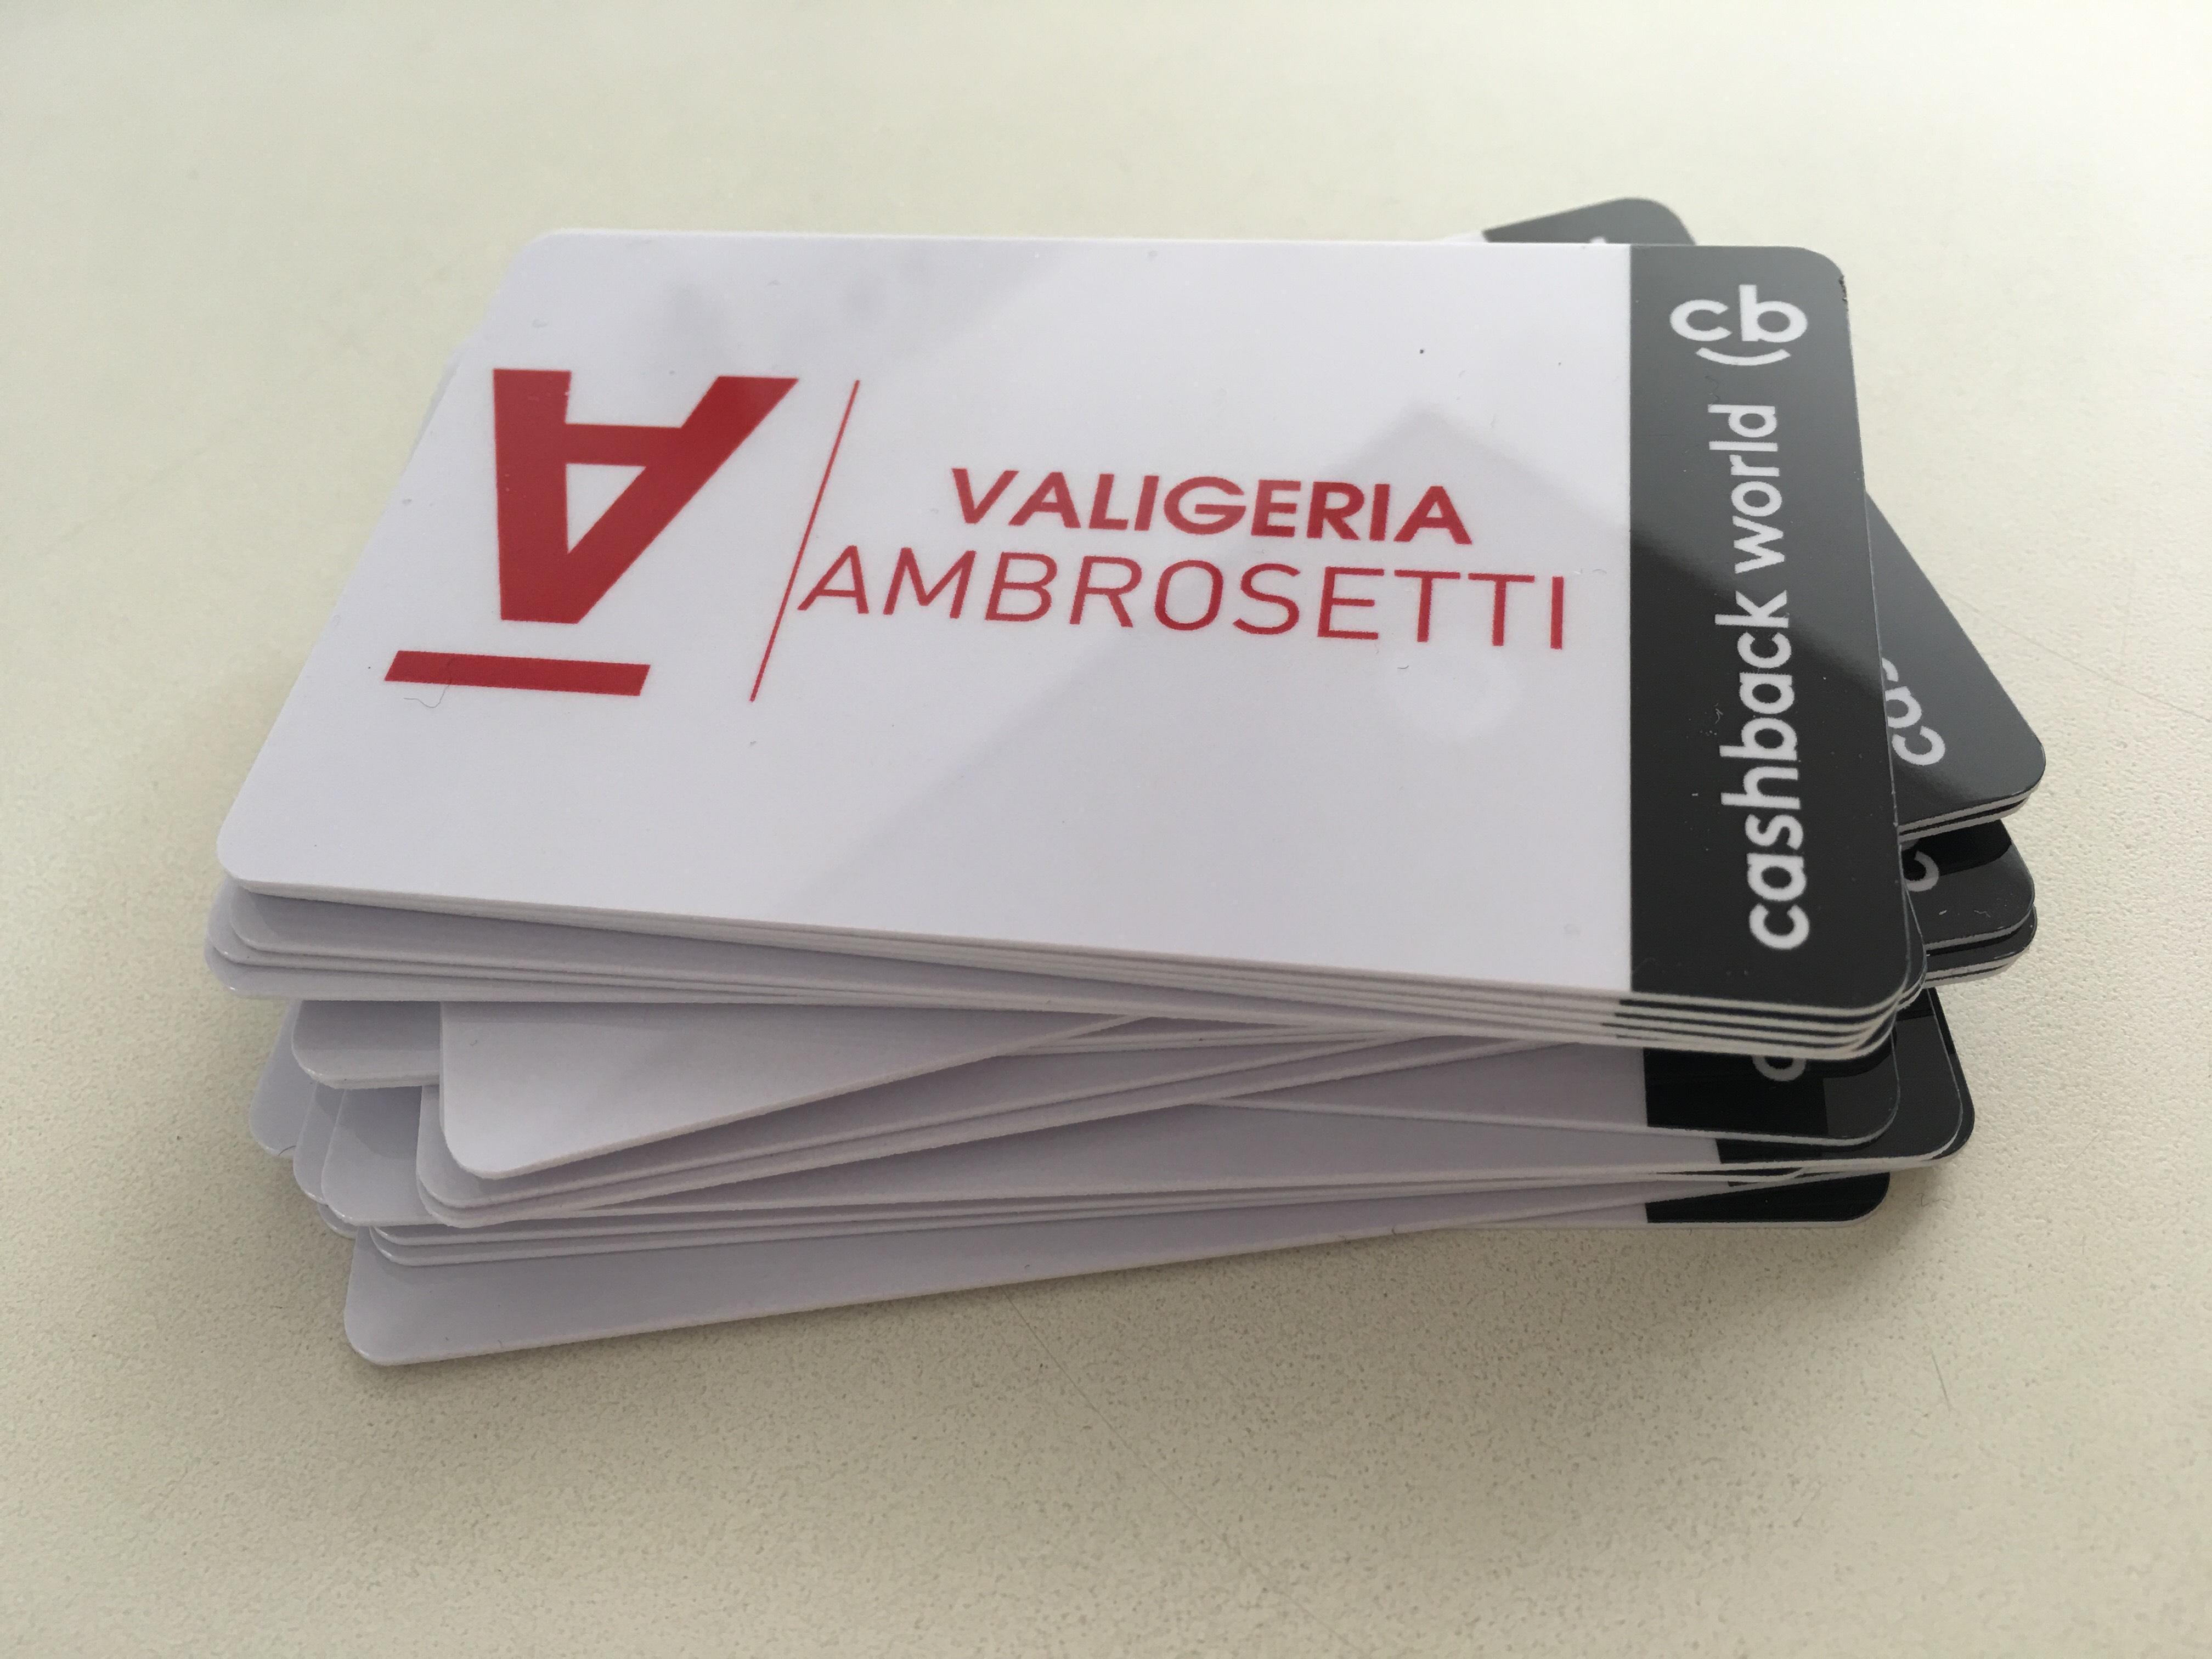 Fidelity-Card-Ambrosetti